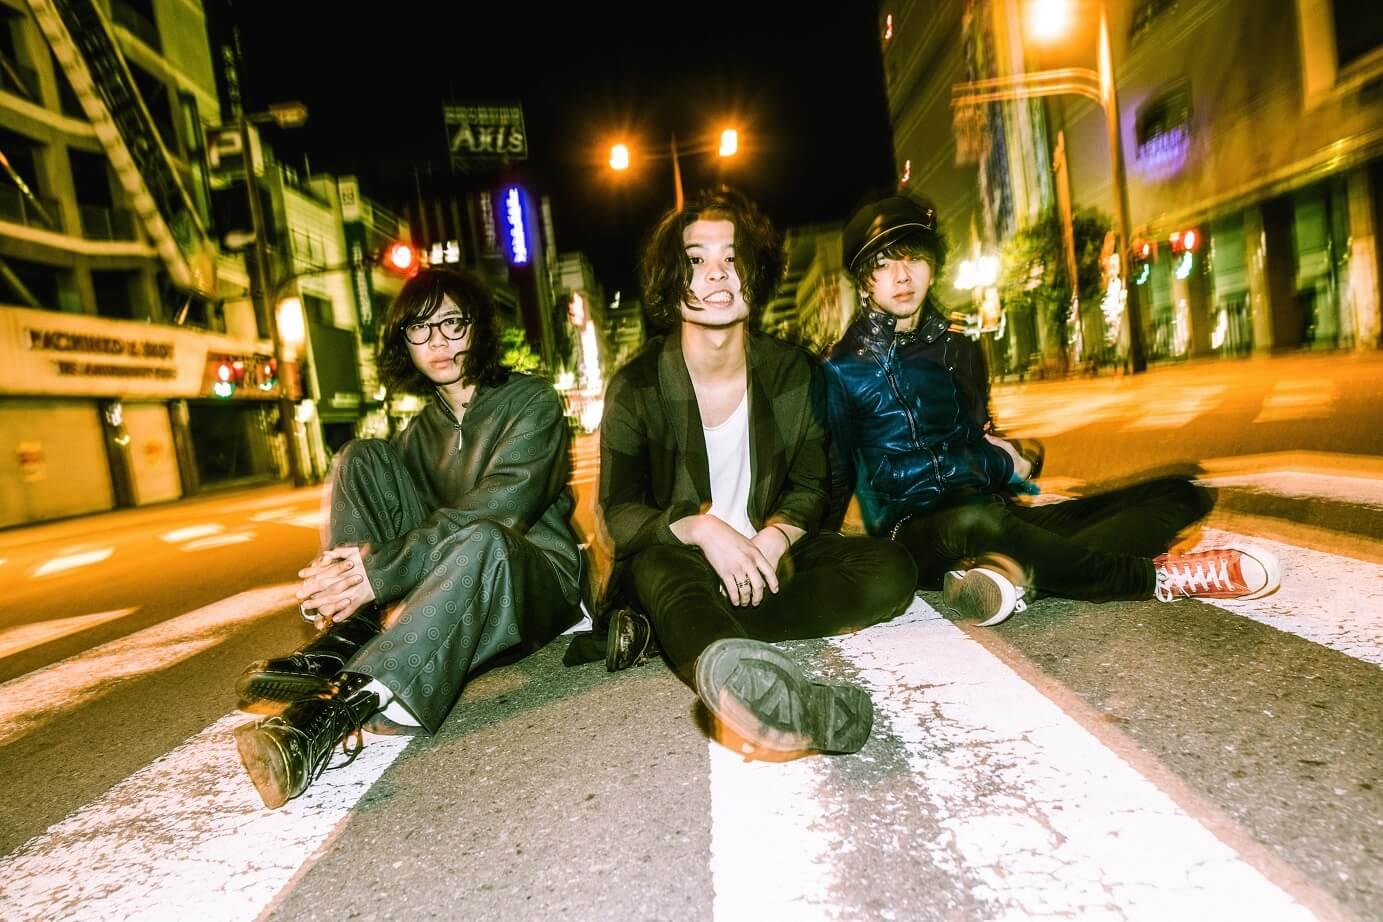 SIX LOUNGE  ミニアルバム「ヴィーナス」収録曲 「ピアシング」MV解禁サムネイル画像!